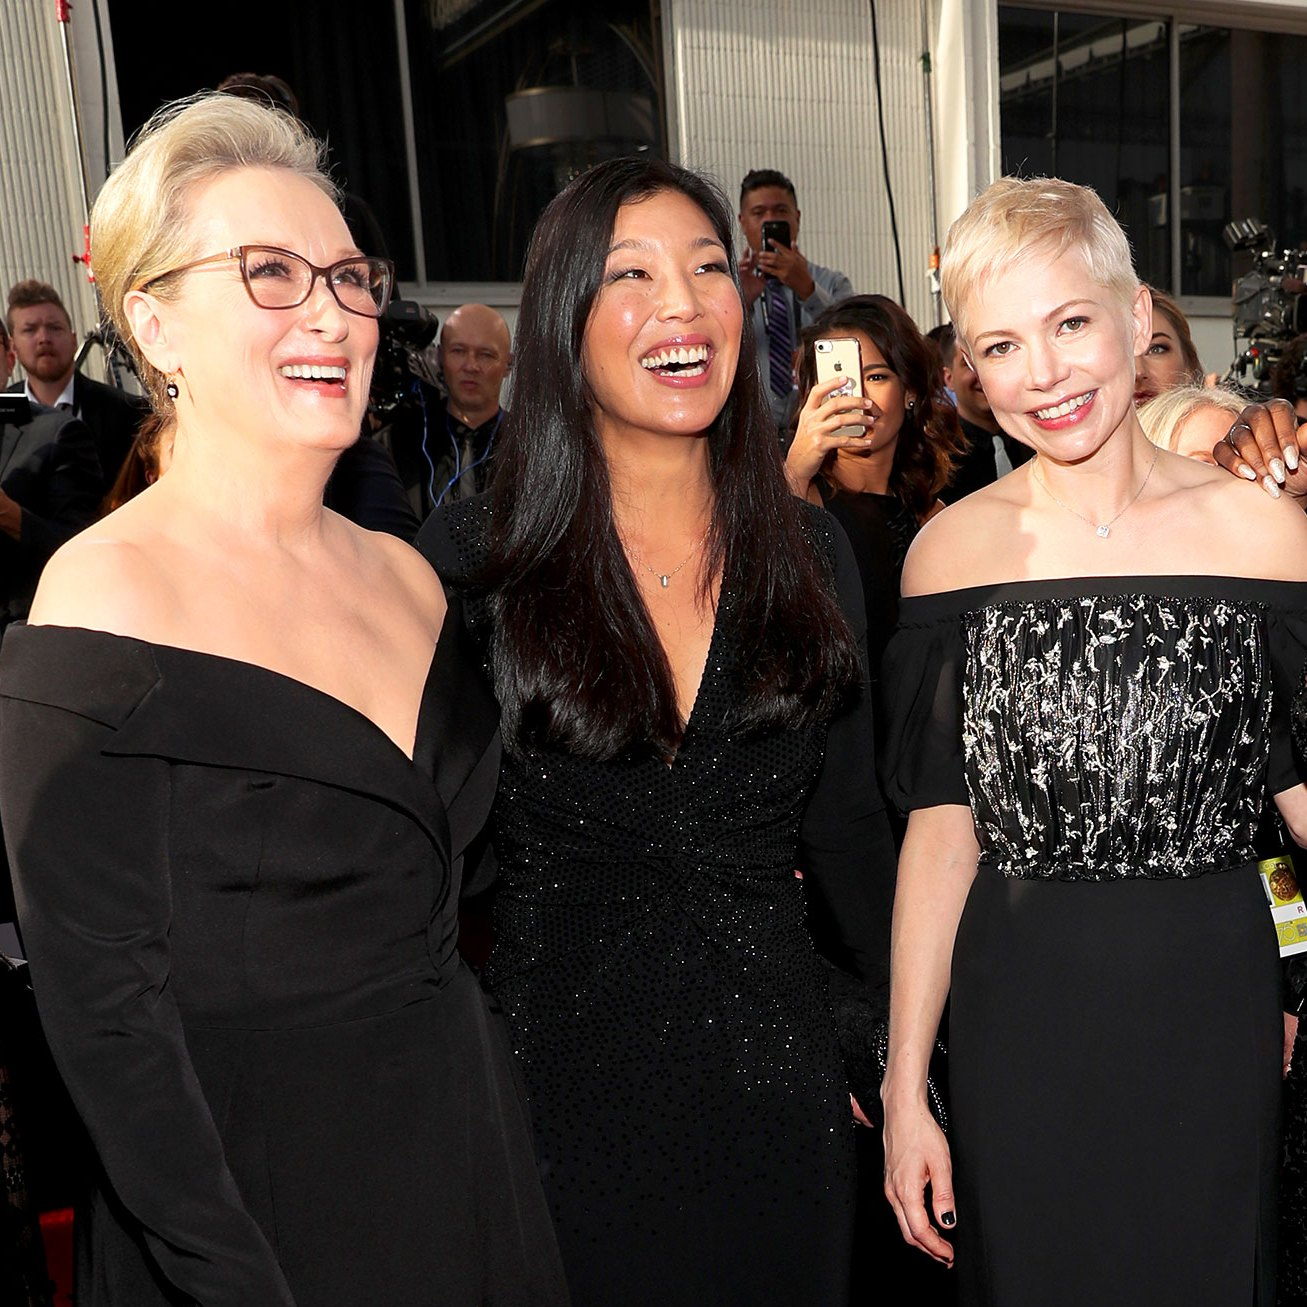 Meryl Streep, Ai-jen Poo, Michelle Williams and Tarana Burke arrive to the 75th Annual Golden Globe Awards held at the Beverly Hilton Hotel on January 7, 2018.